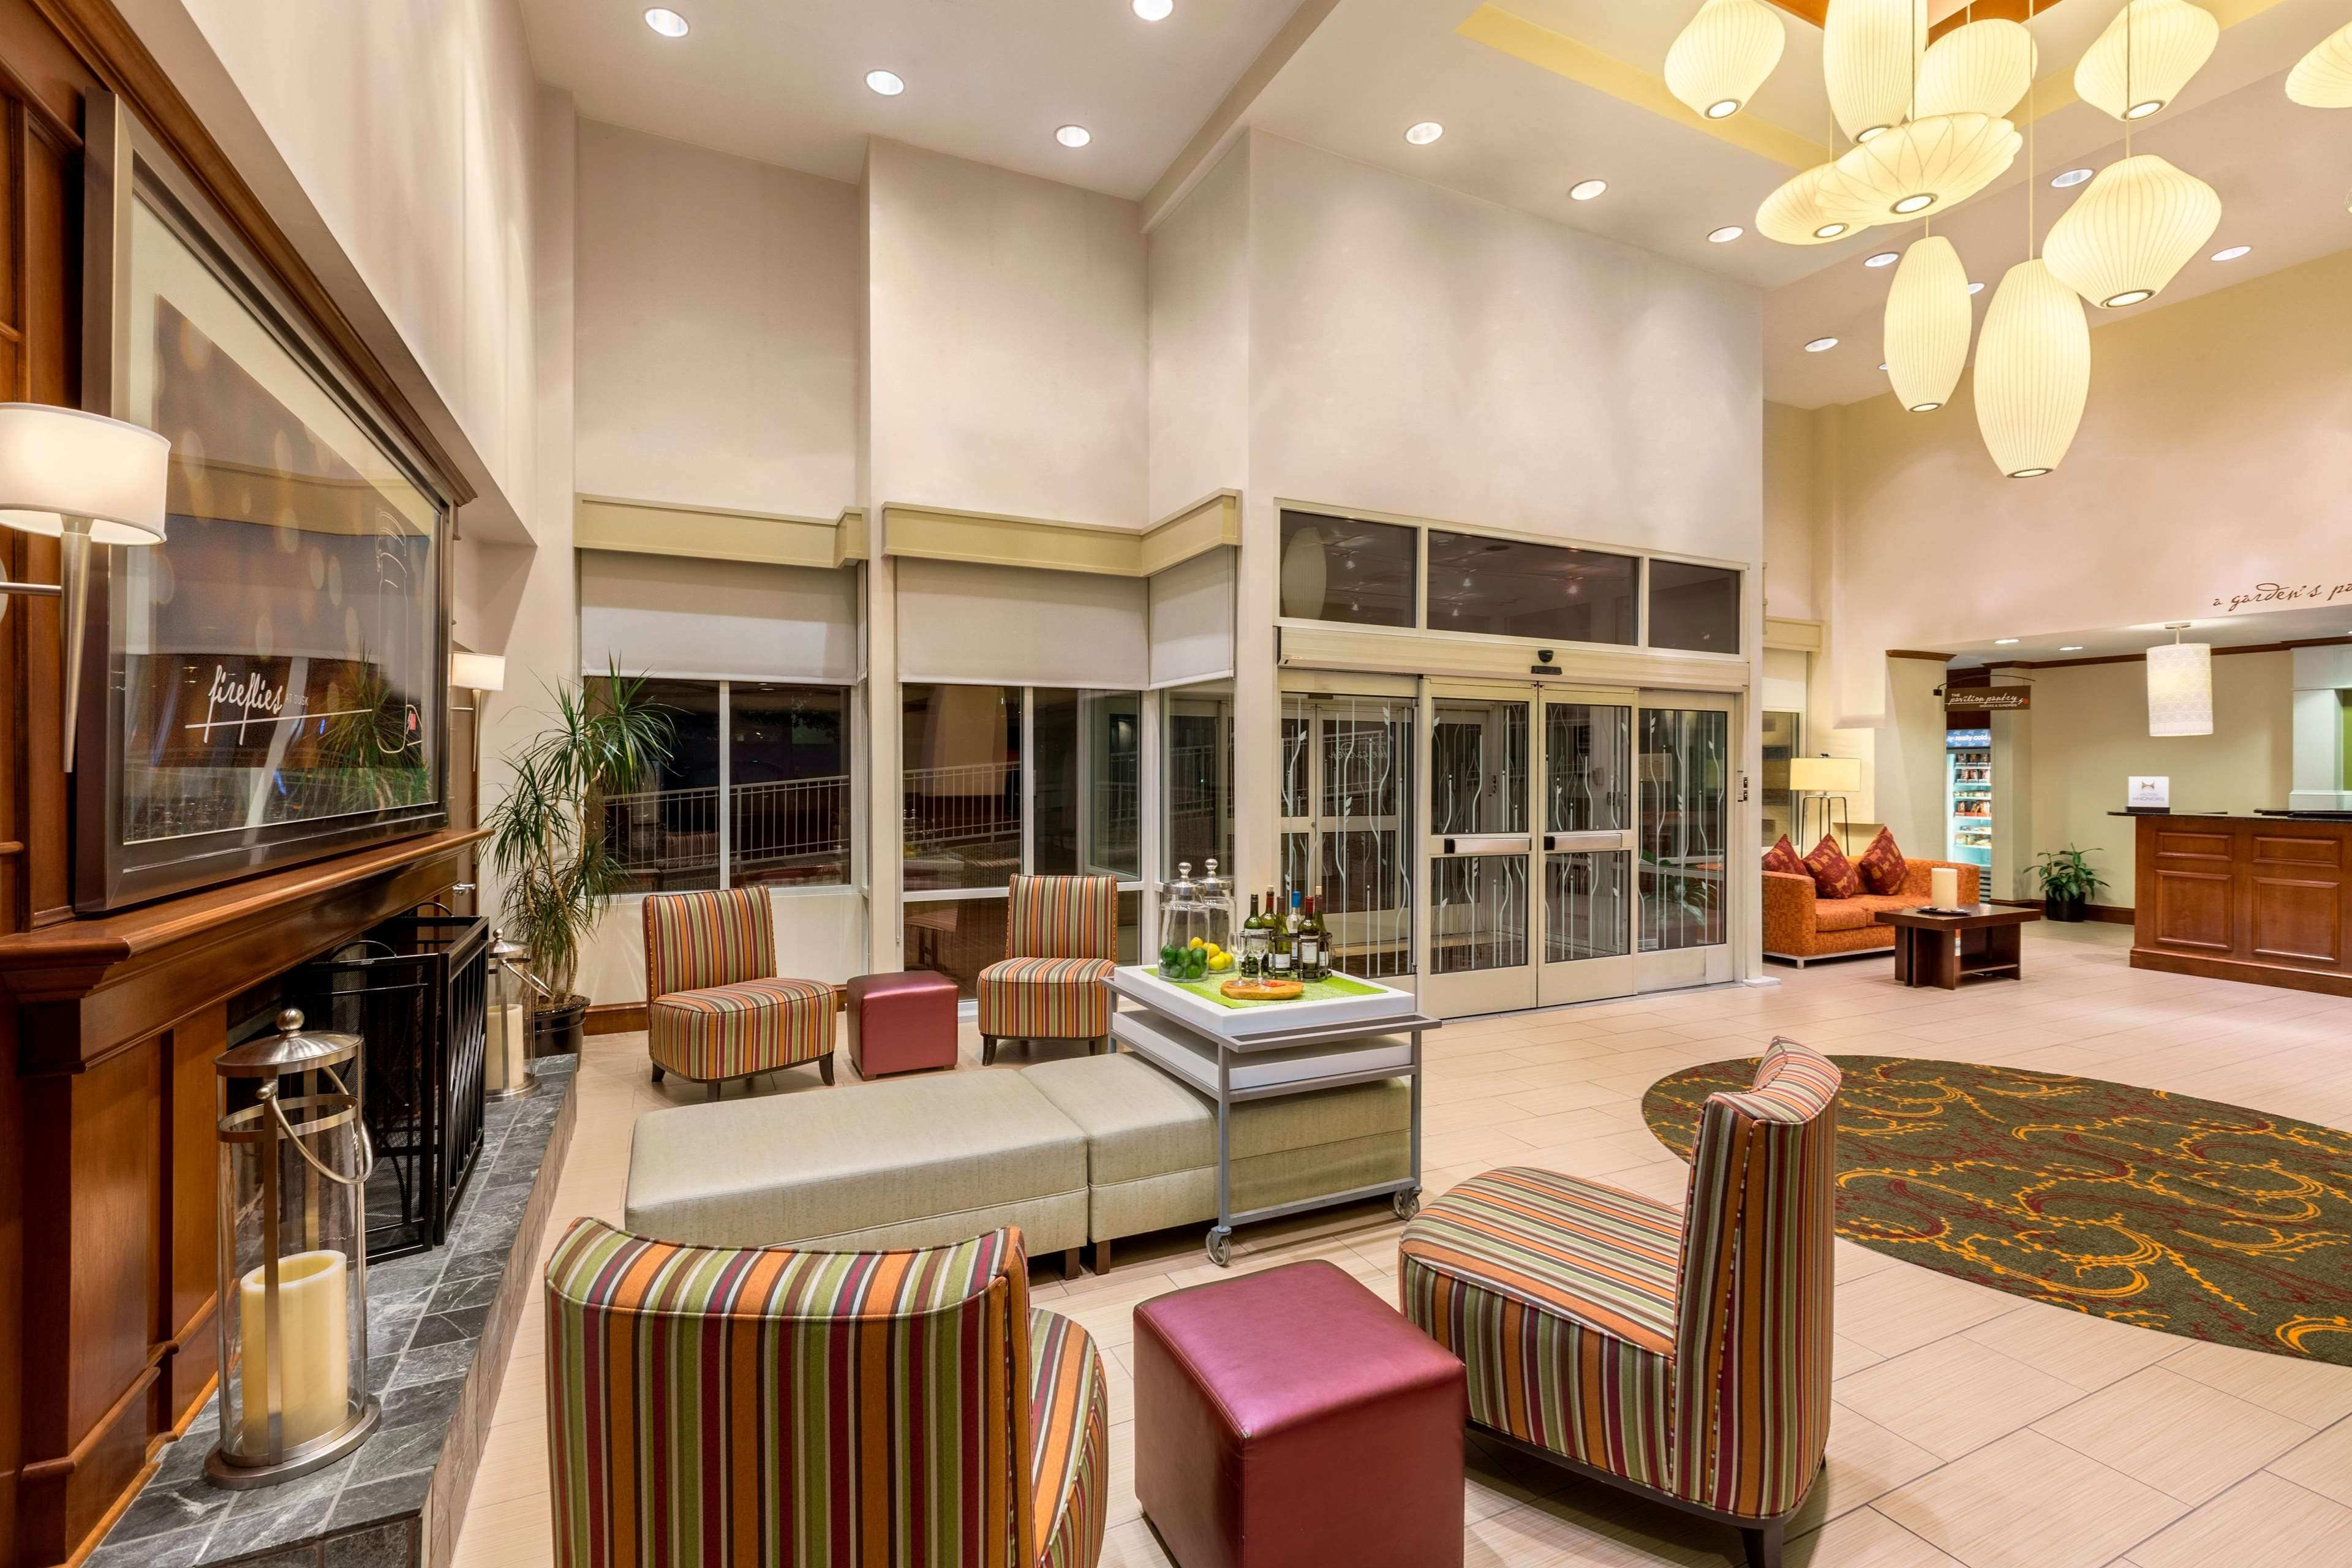 Hilton Garden Inn Arlington/Courthouse Plaza image 17